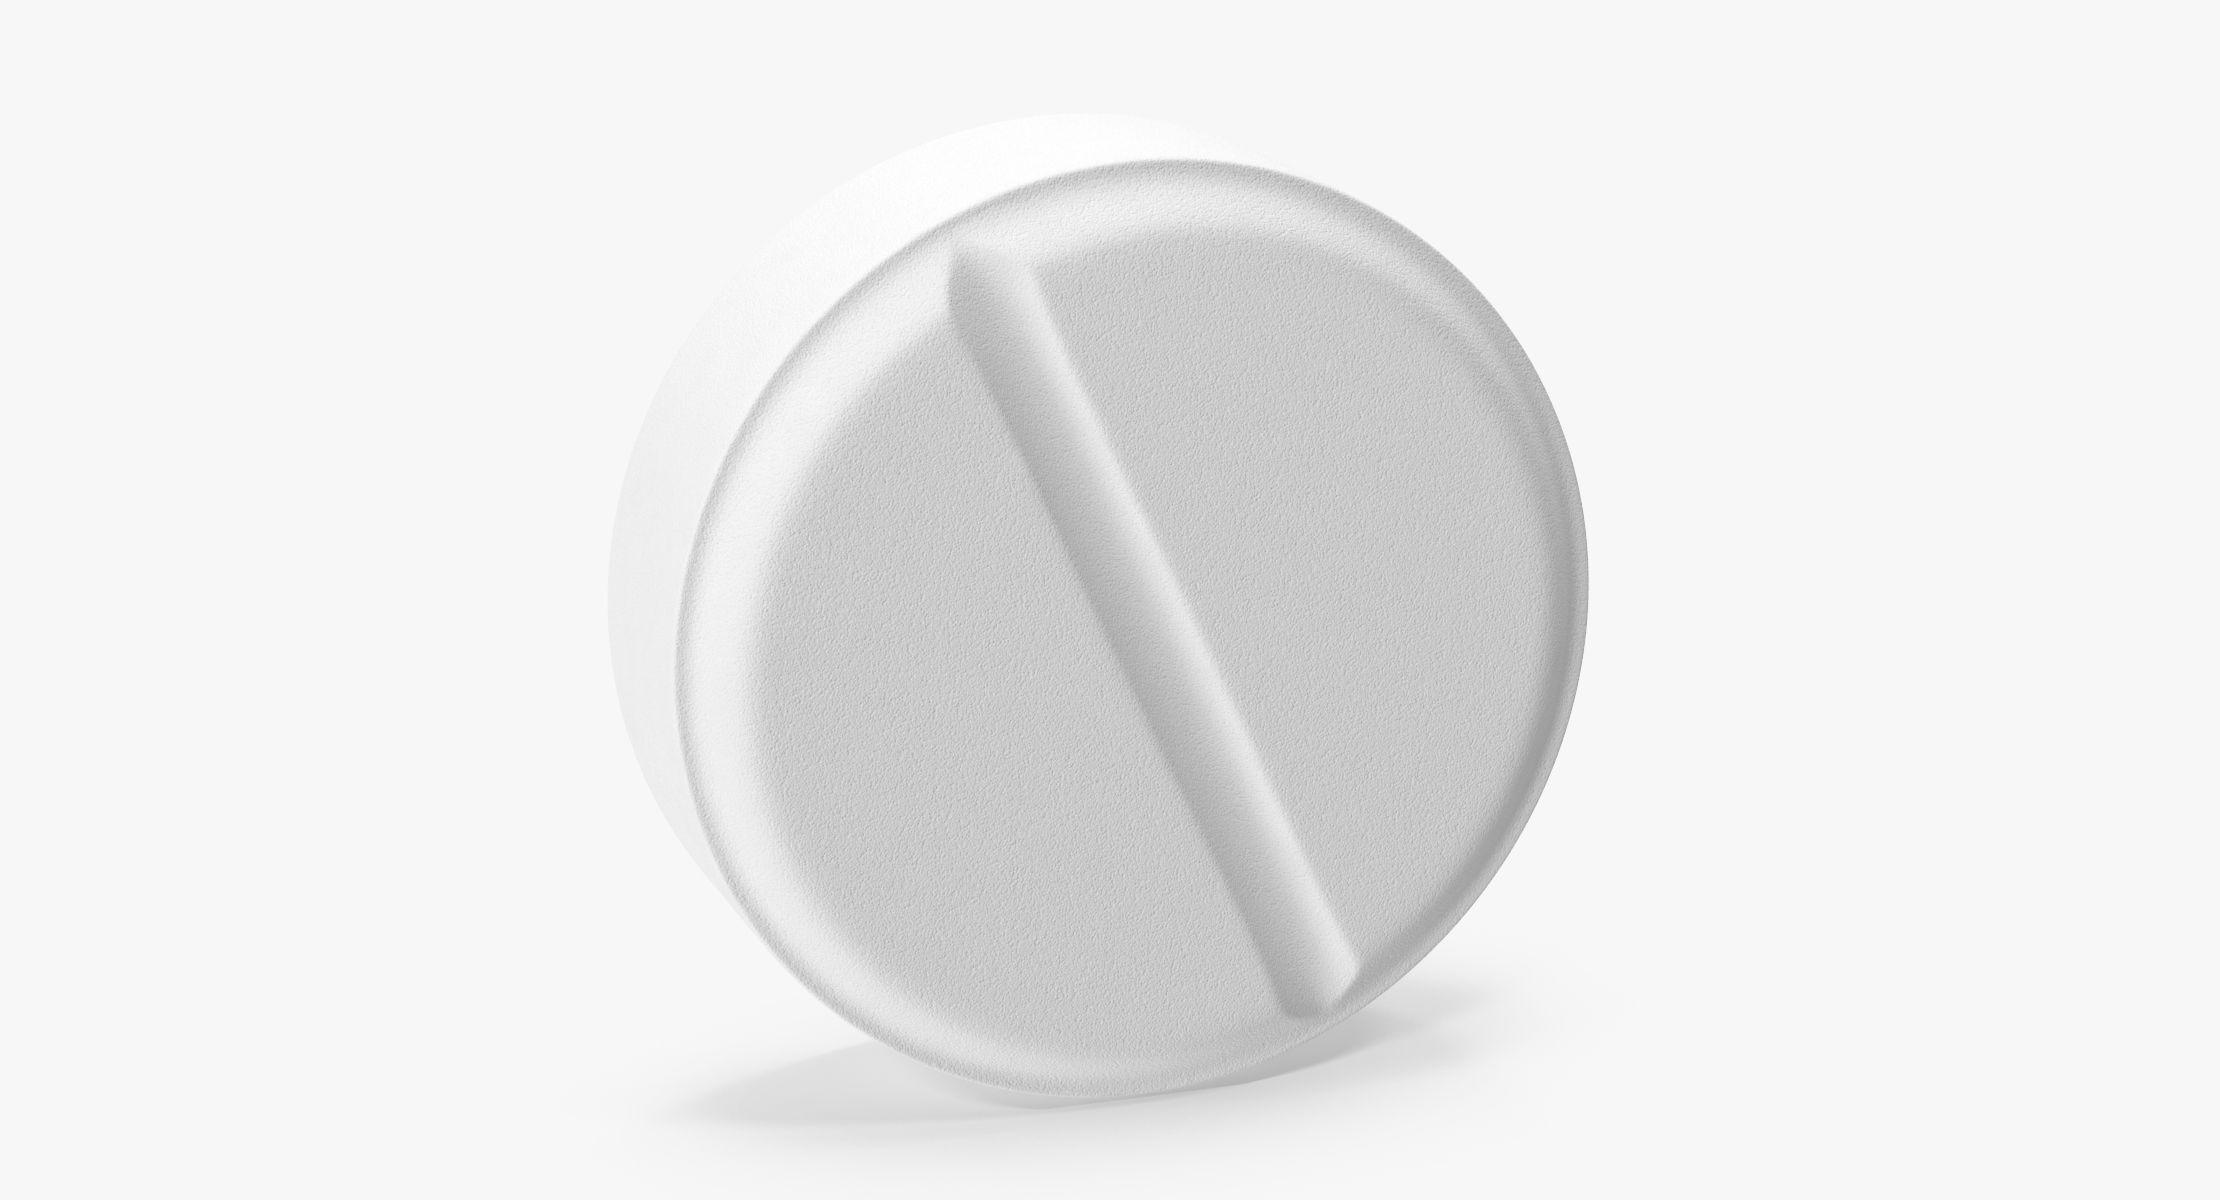 Aspirin - reel 1